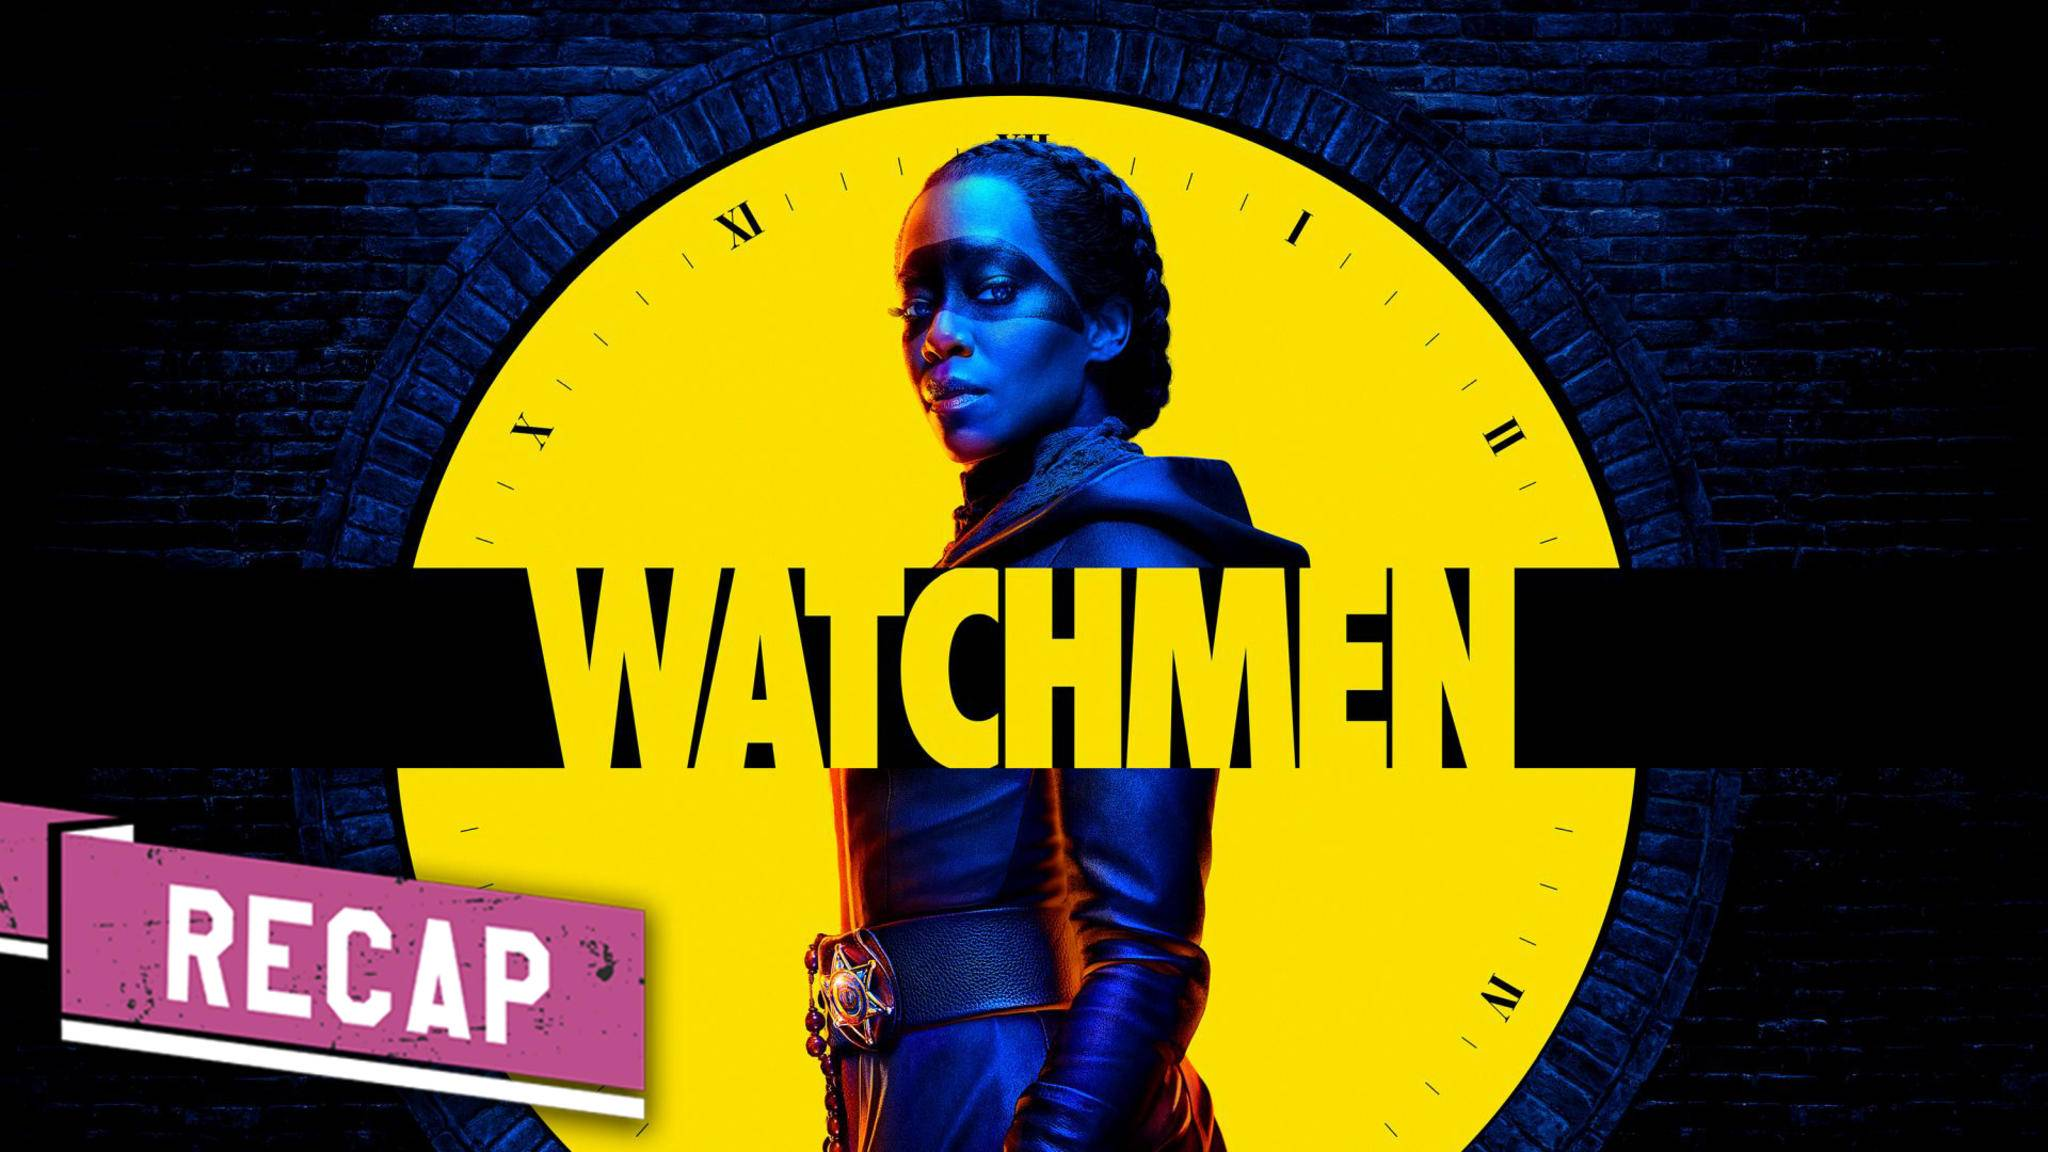 Watchmen Serie Kritik